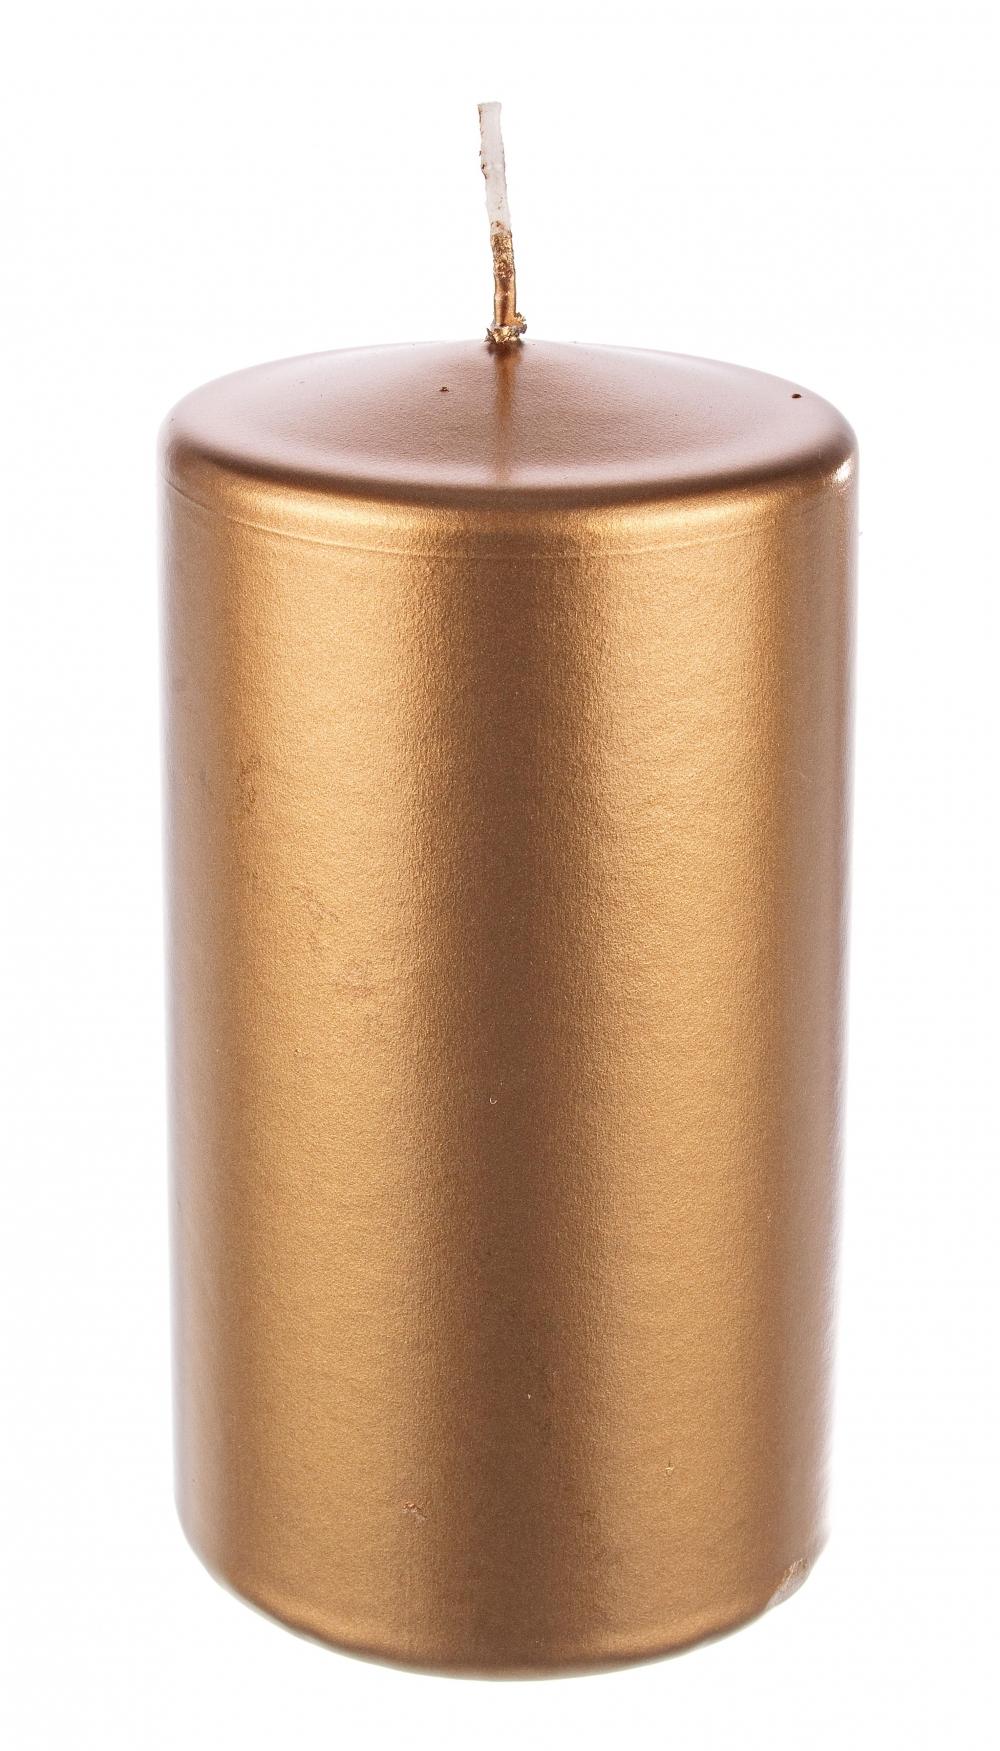 Lumanare stalp Copper H12cm imagine 2021 insignis.ro